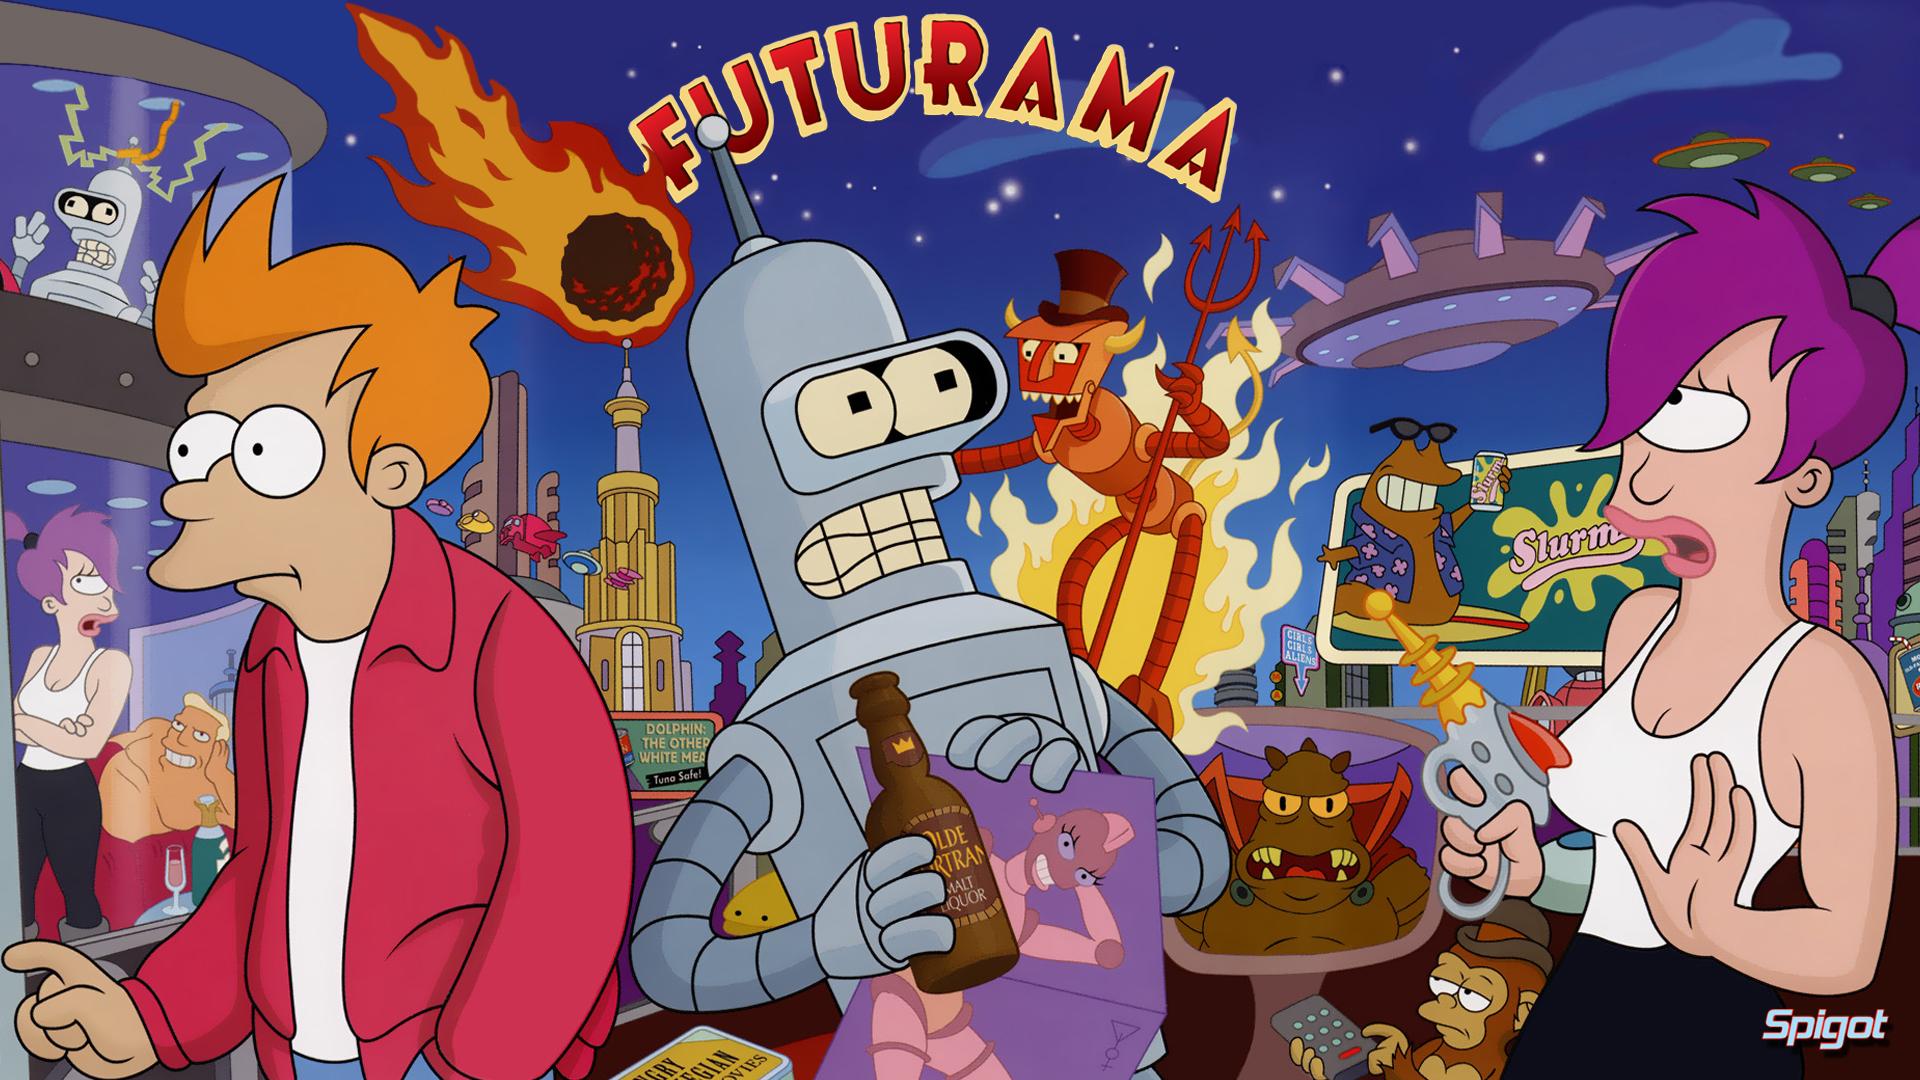 Futurama Backgrounds, Compatible - PC, Mobile, Gadgets  1920x1080 px